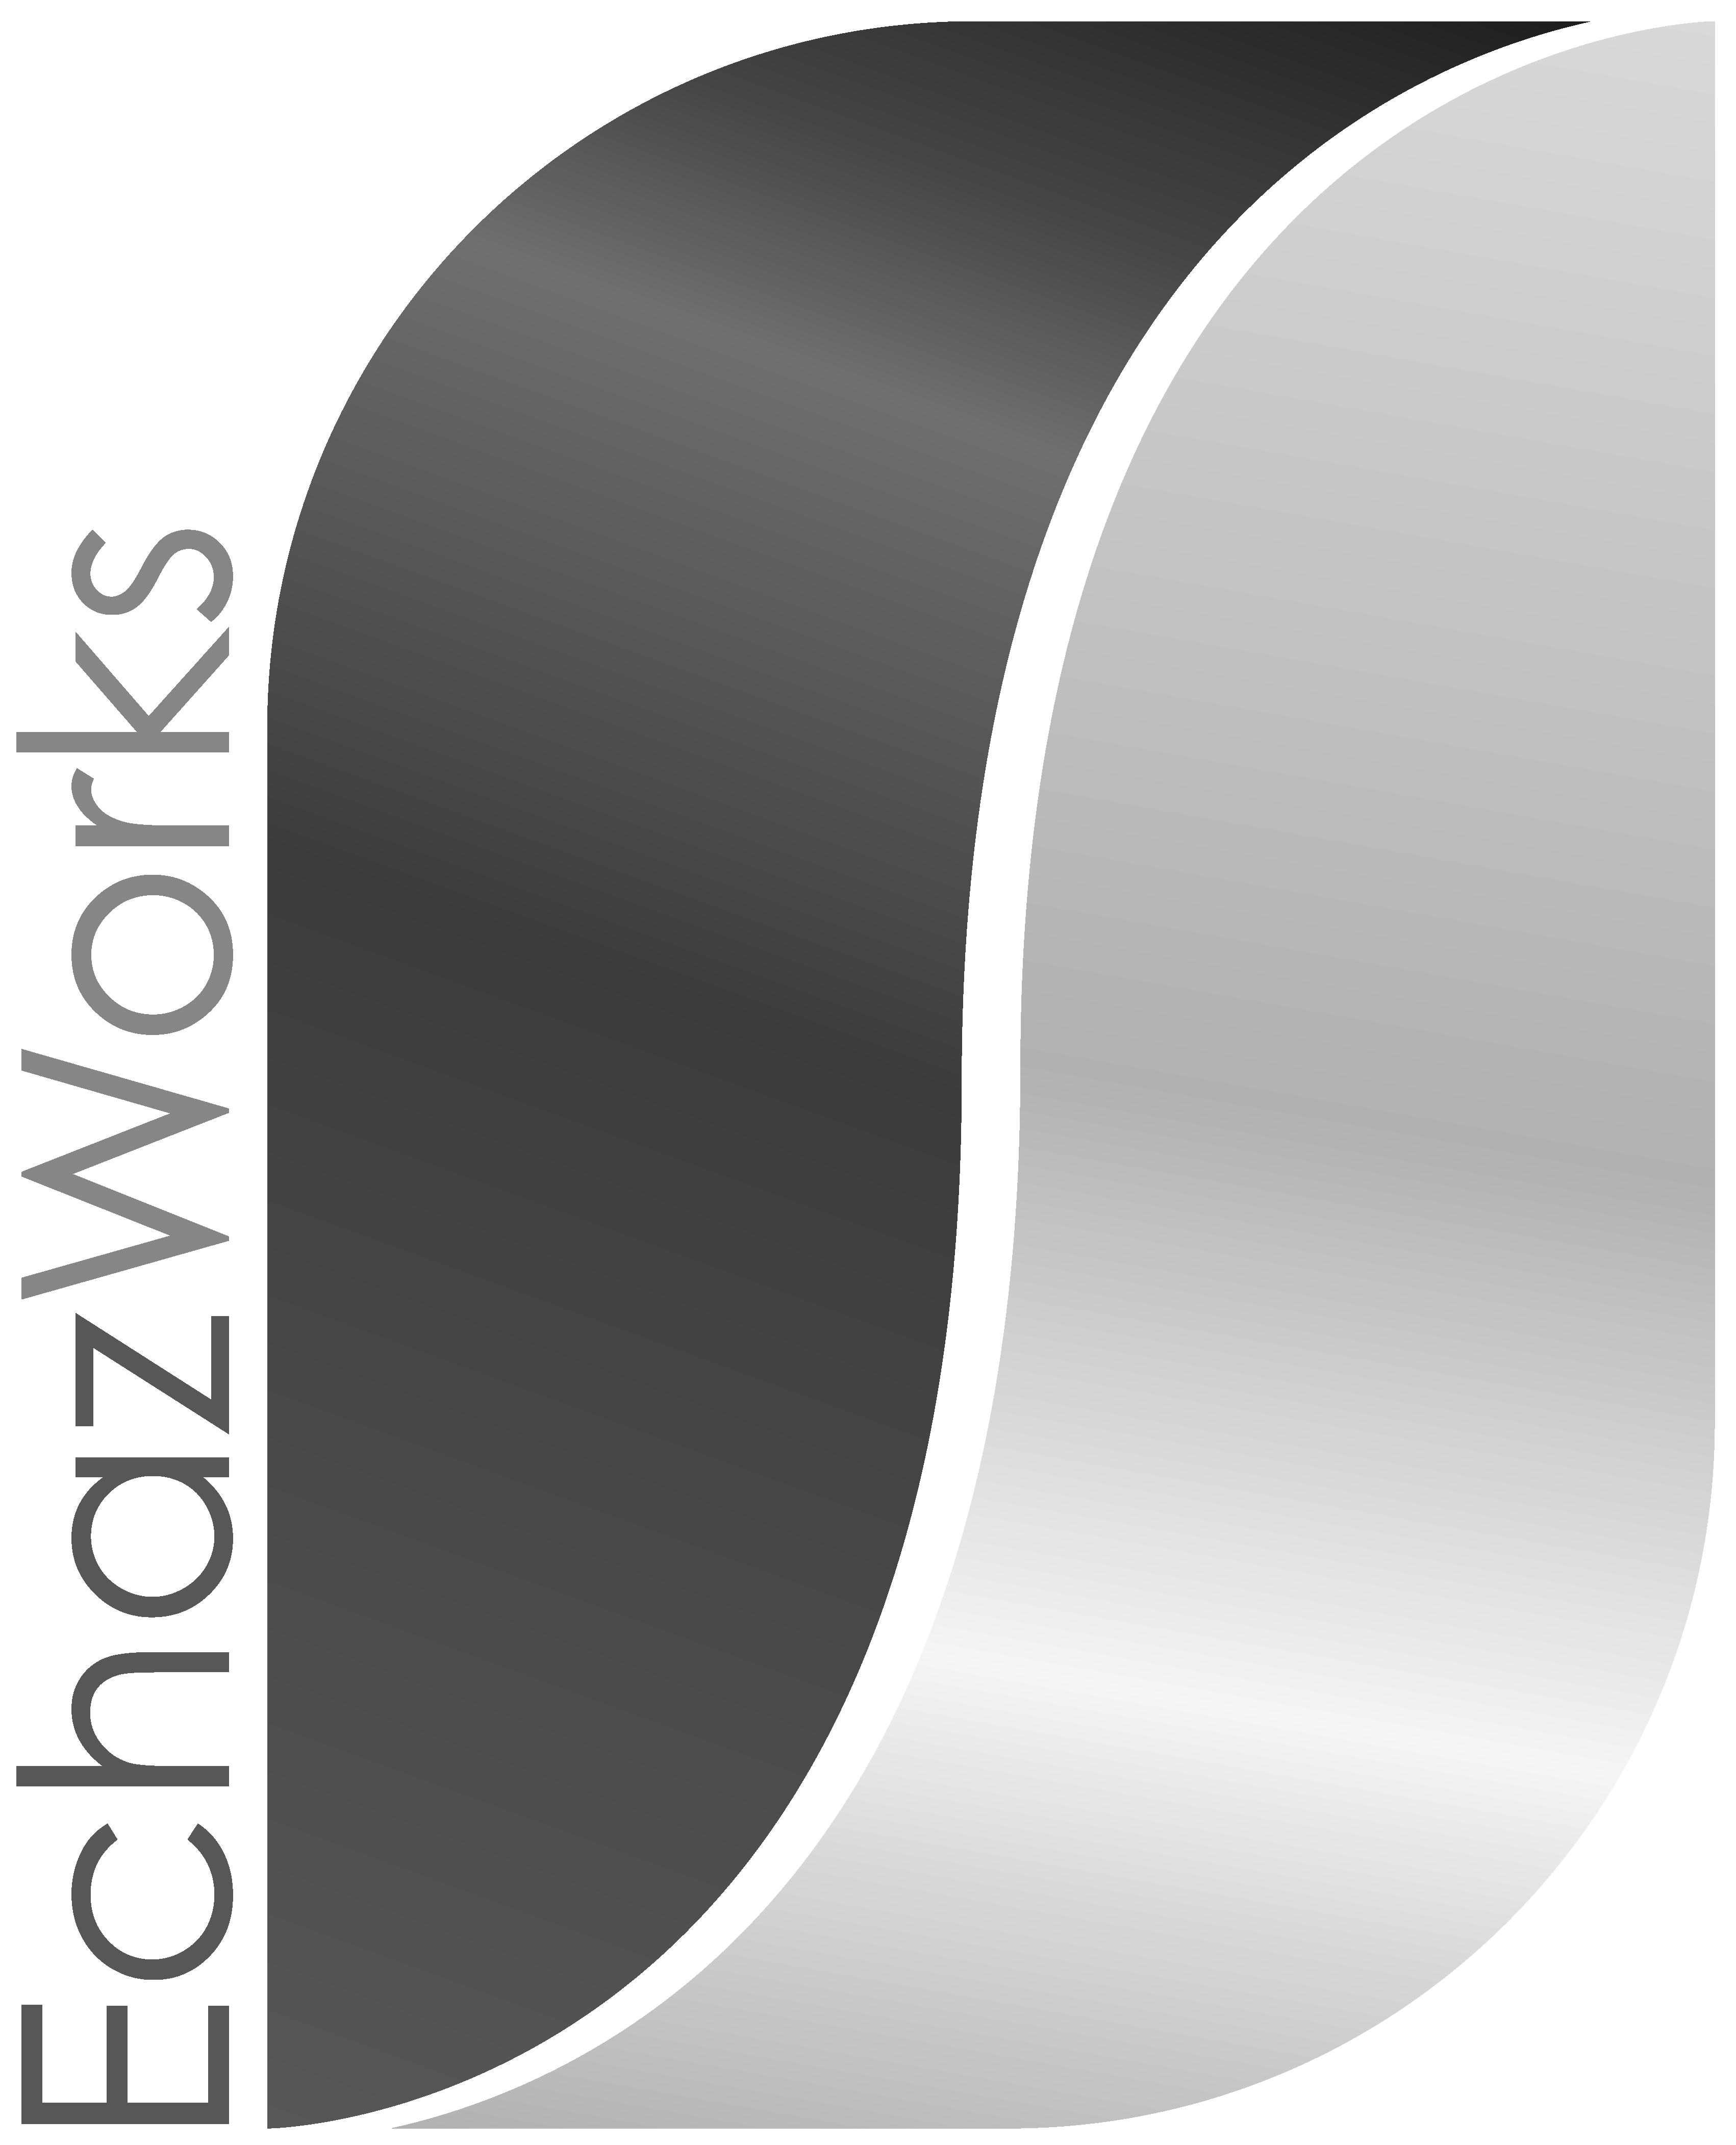 Echazworks